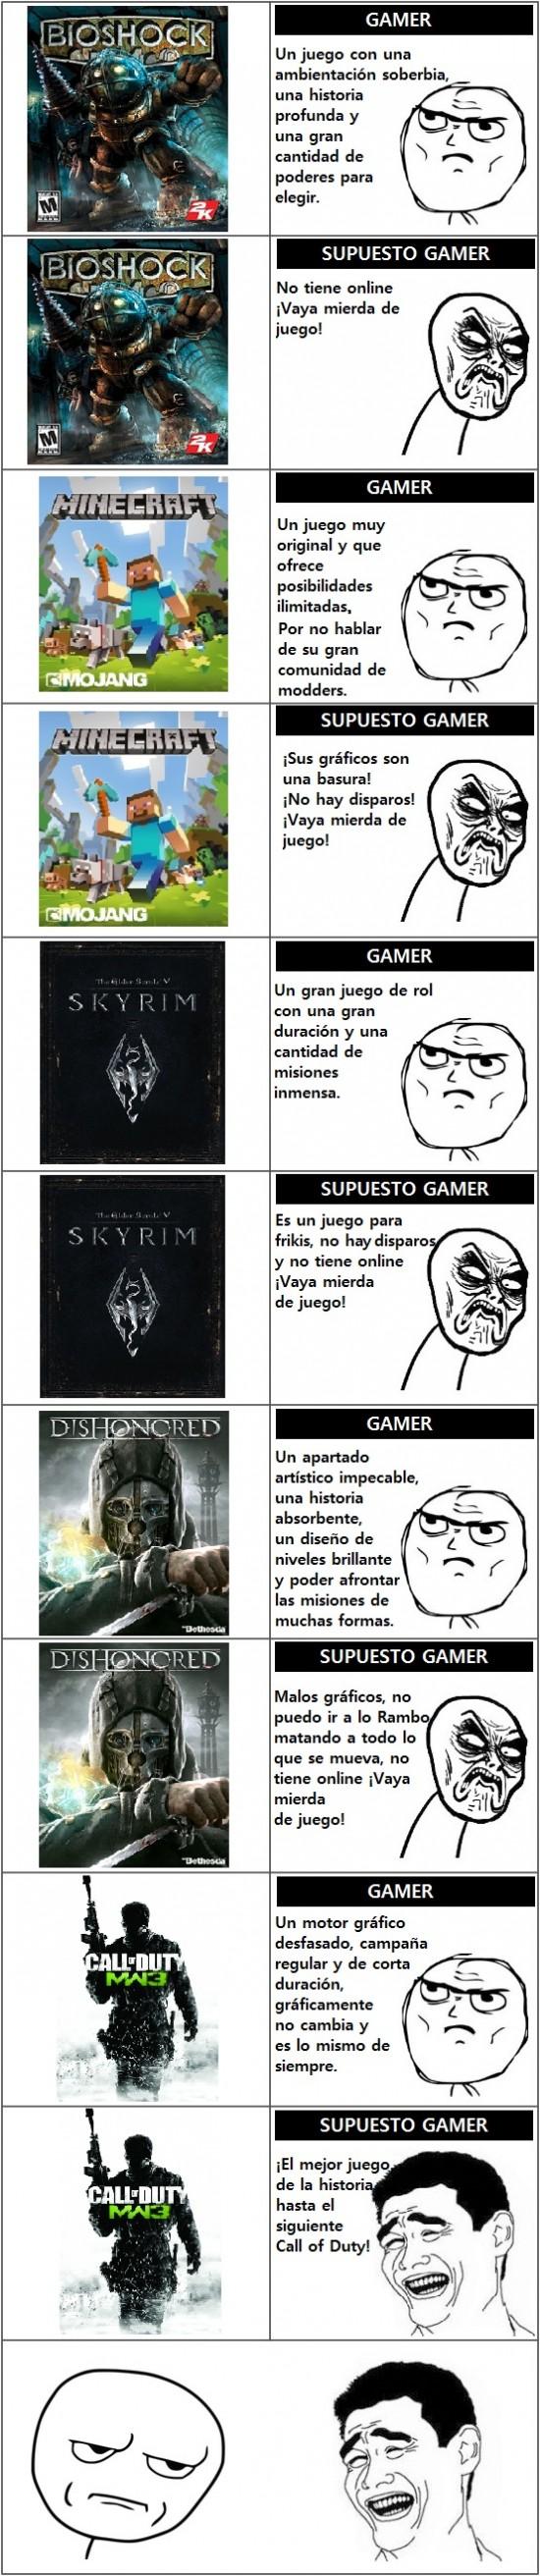 Kidding_me - Sutiles diferencias entre gamers